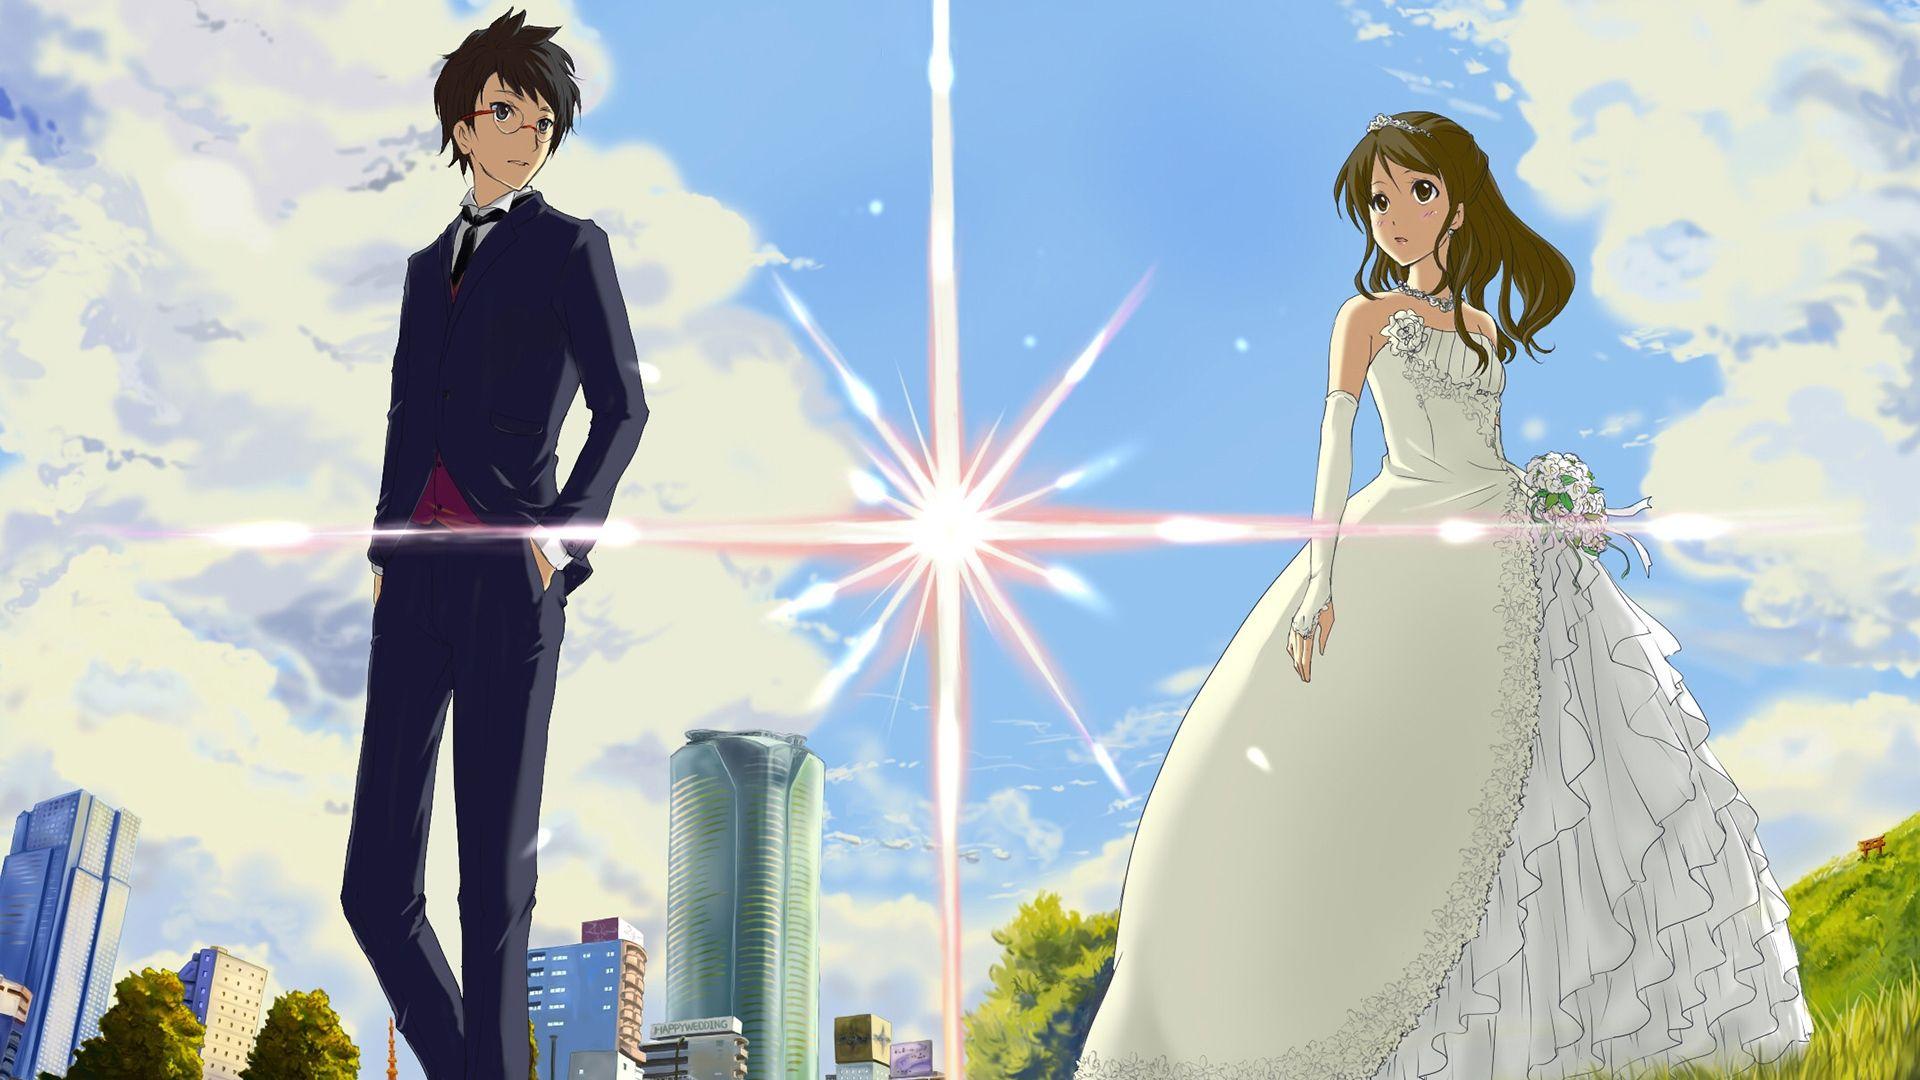 Pin by Xenon Sobdiel on Anime Wallpaper Kimi no na wa